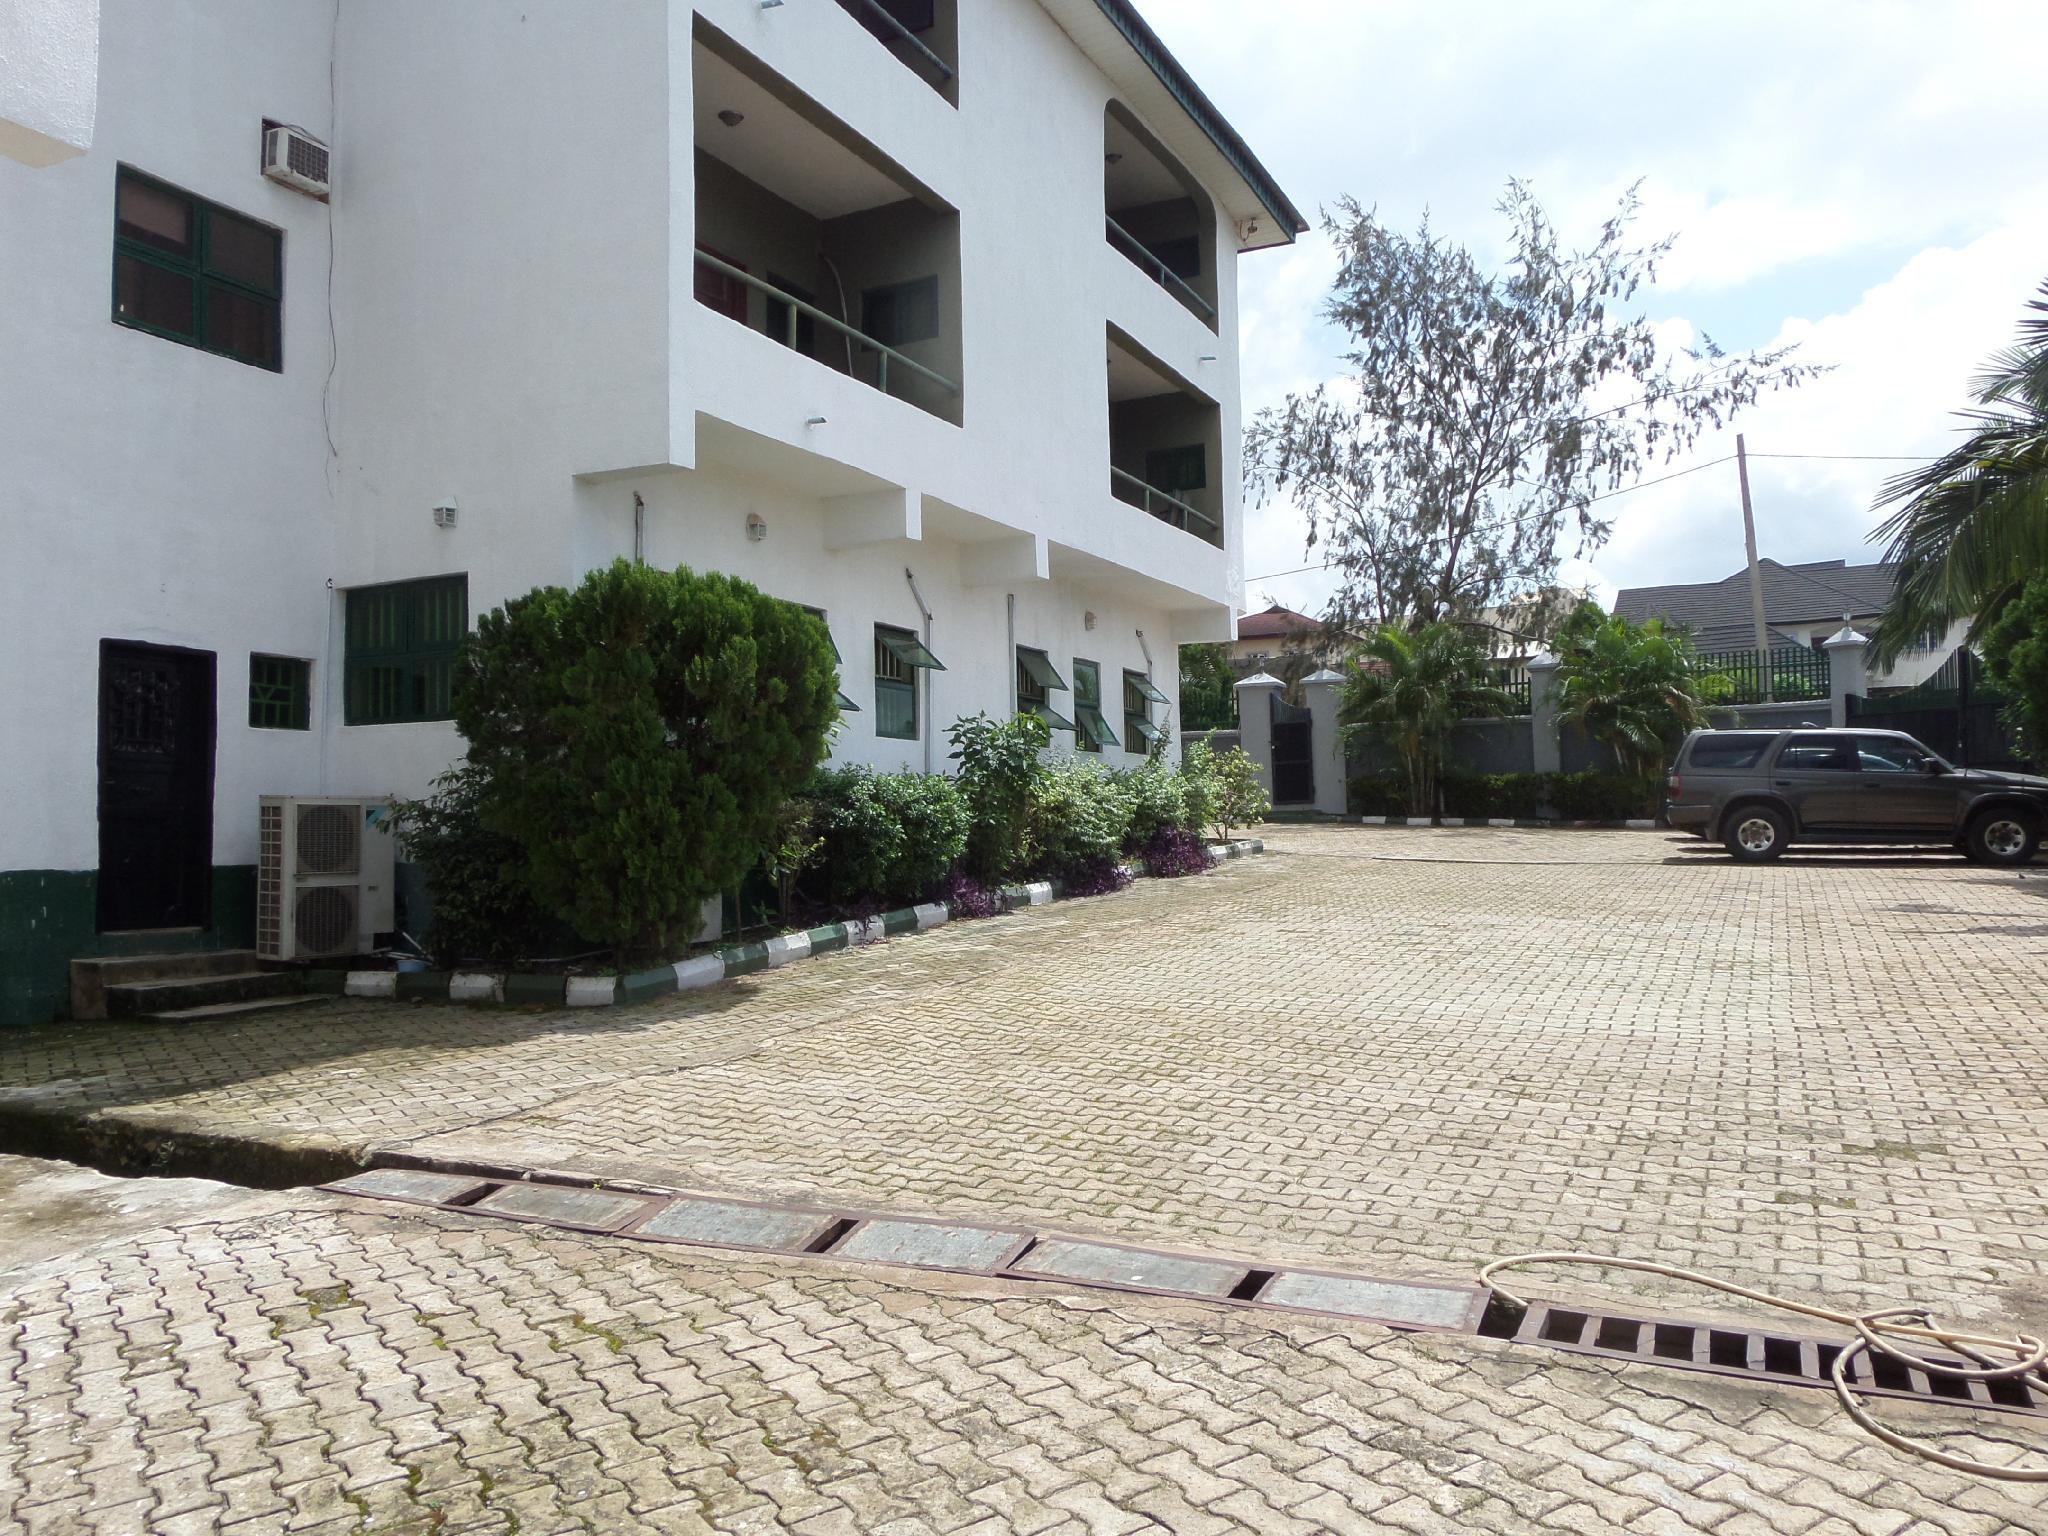 DE New Lanmark Hotel, IbadanNorth-West